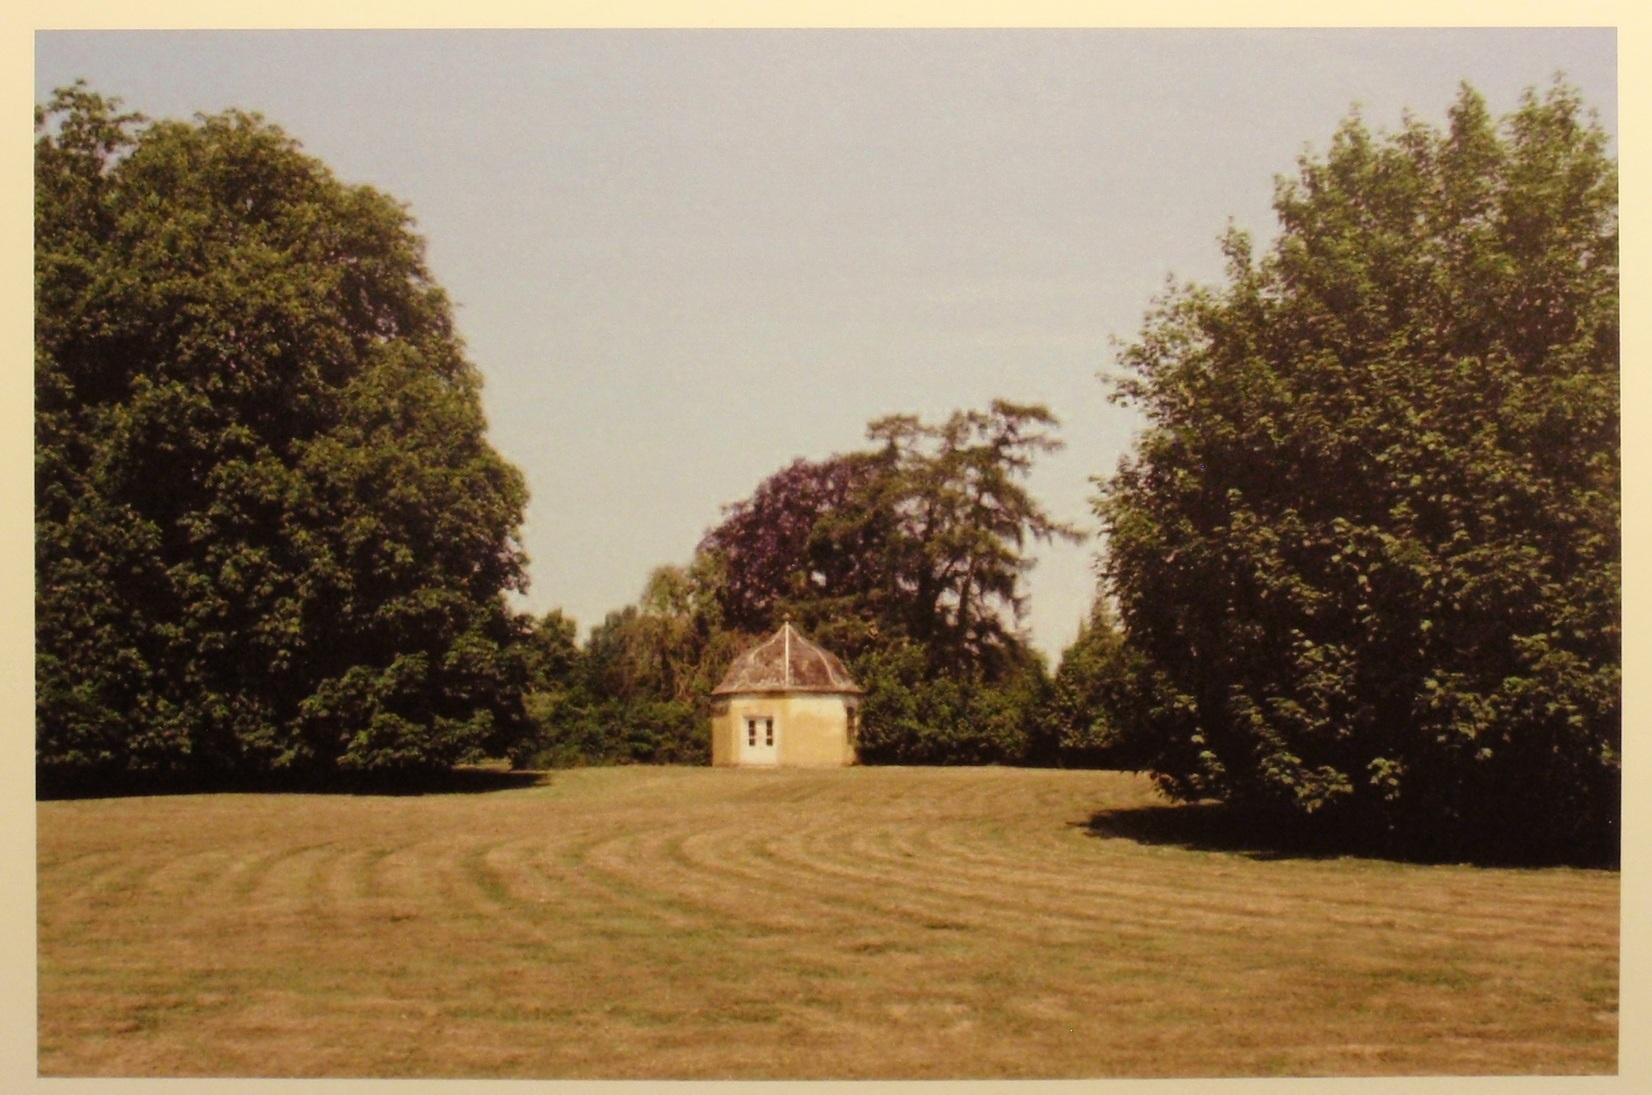 ca. 1980: 8-kantet lysthus